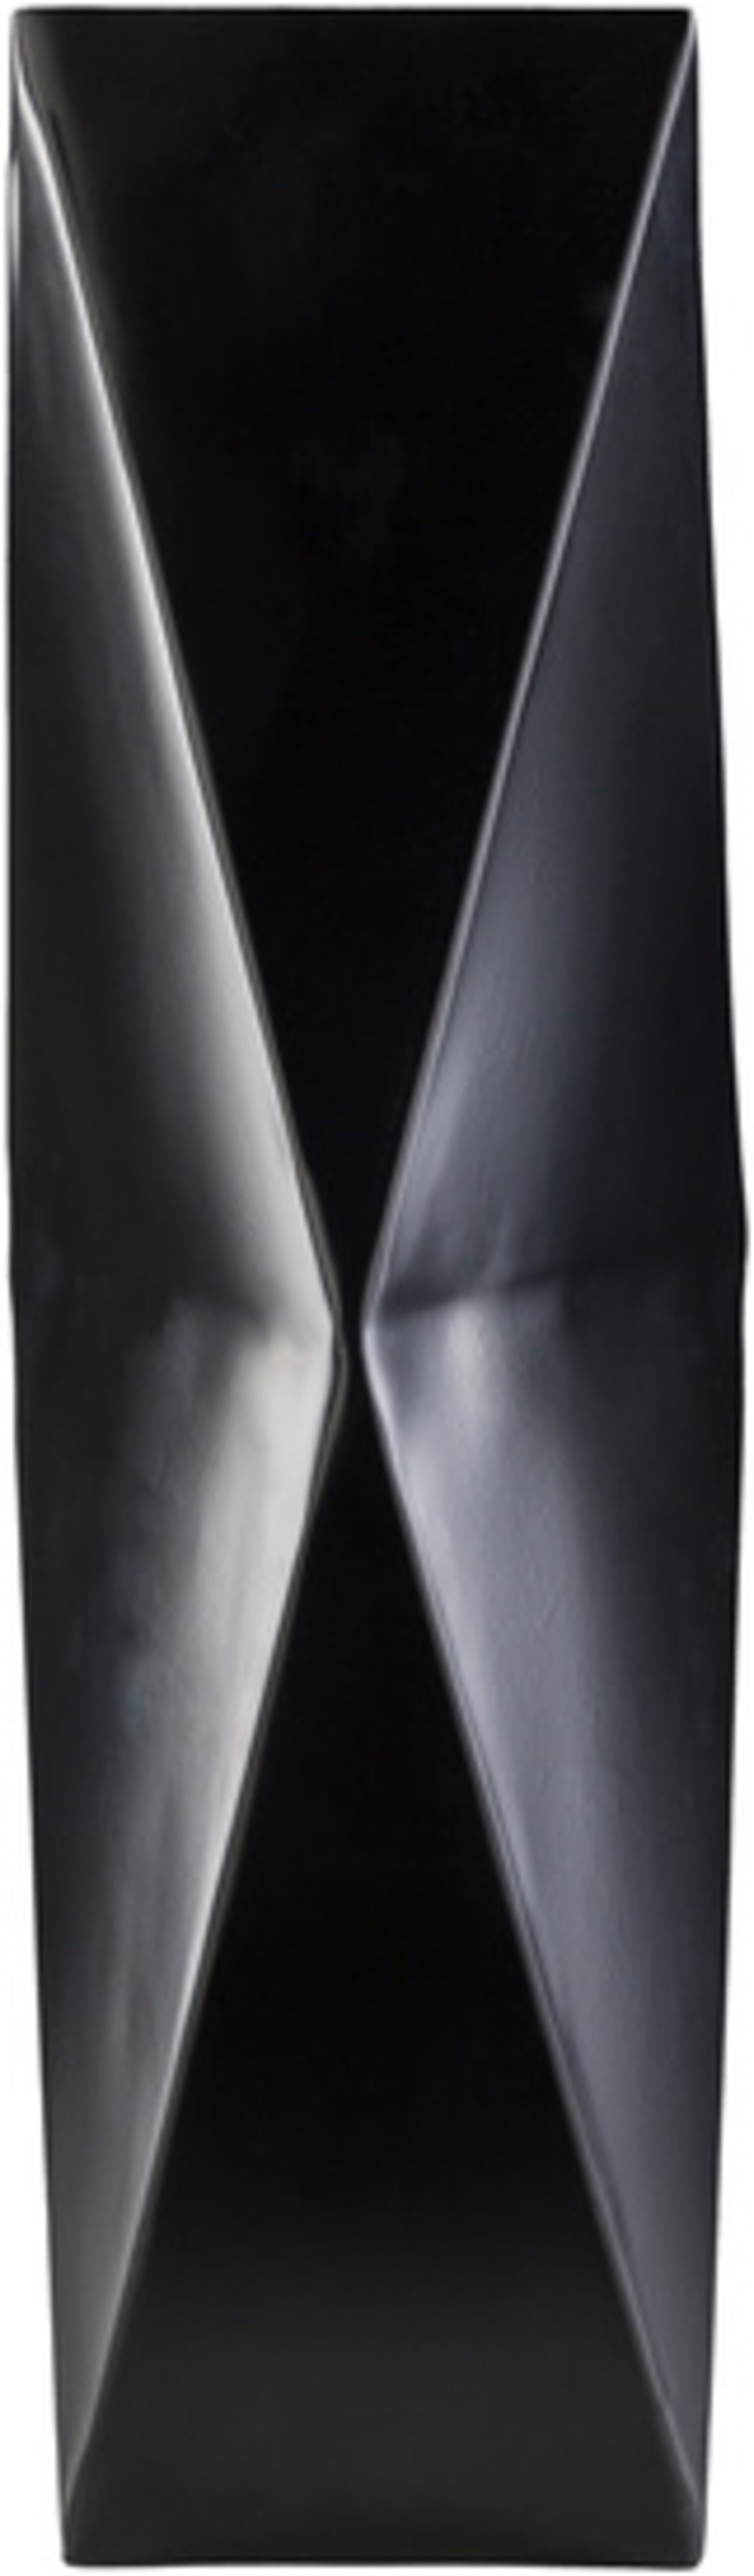 Surya - Ross Vase